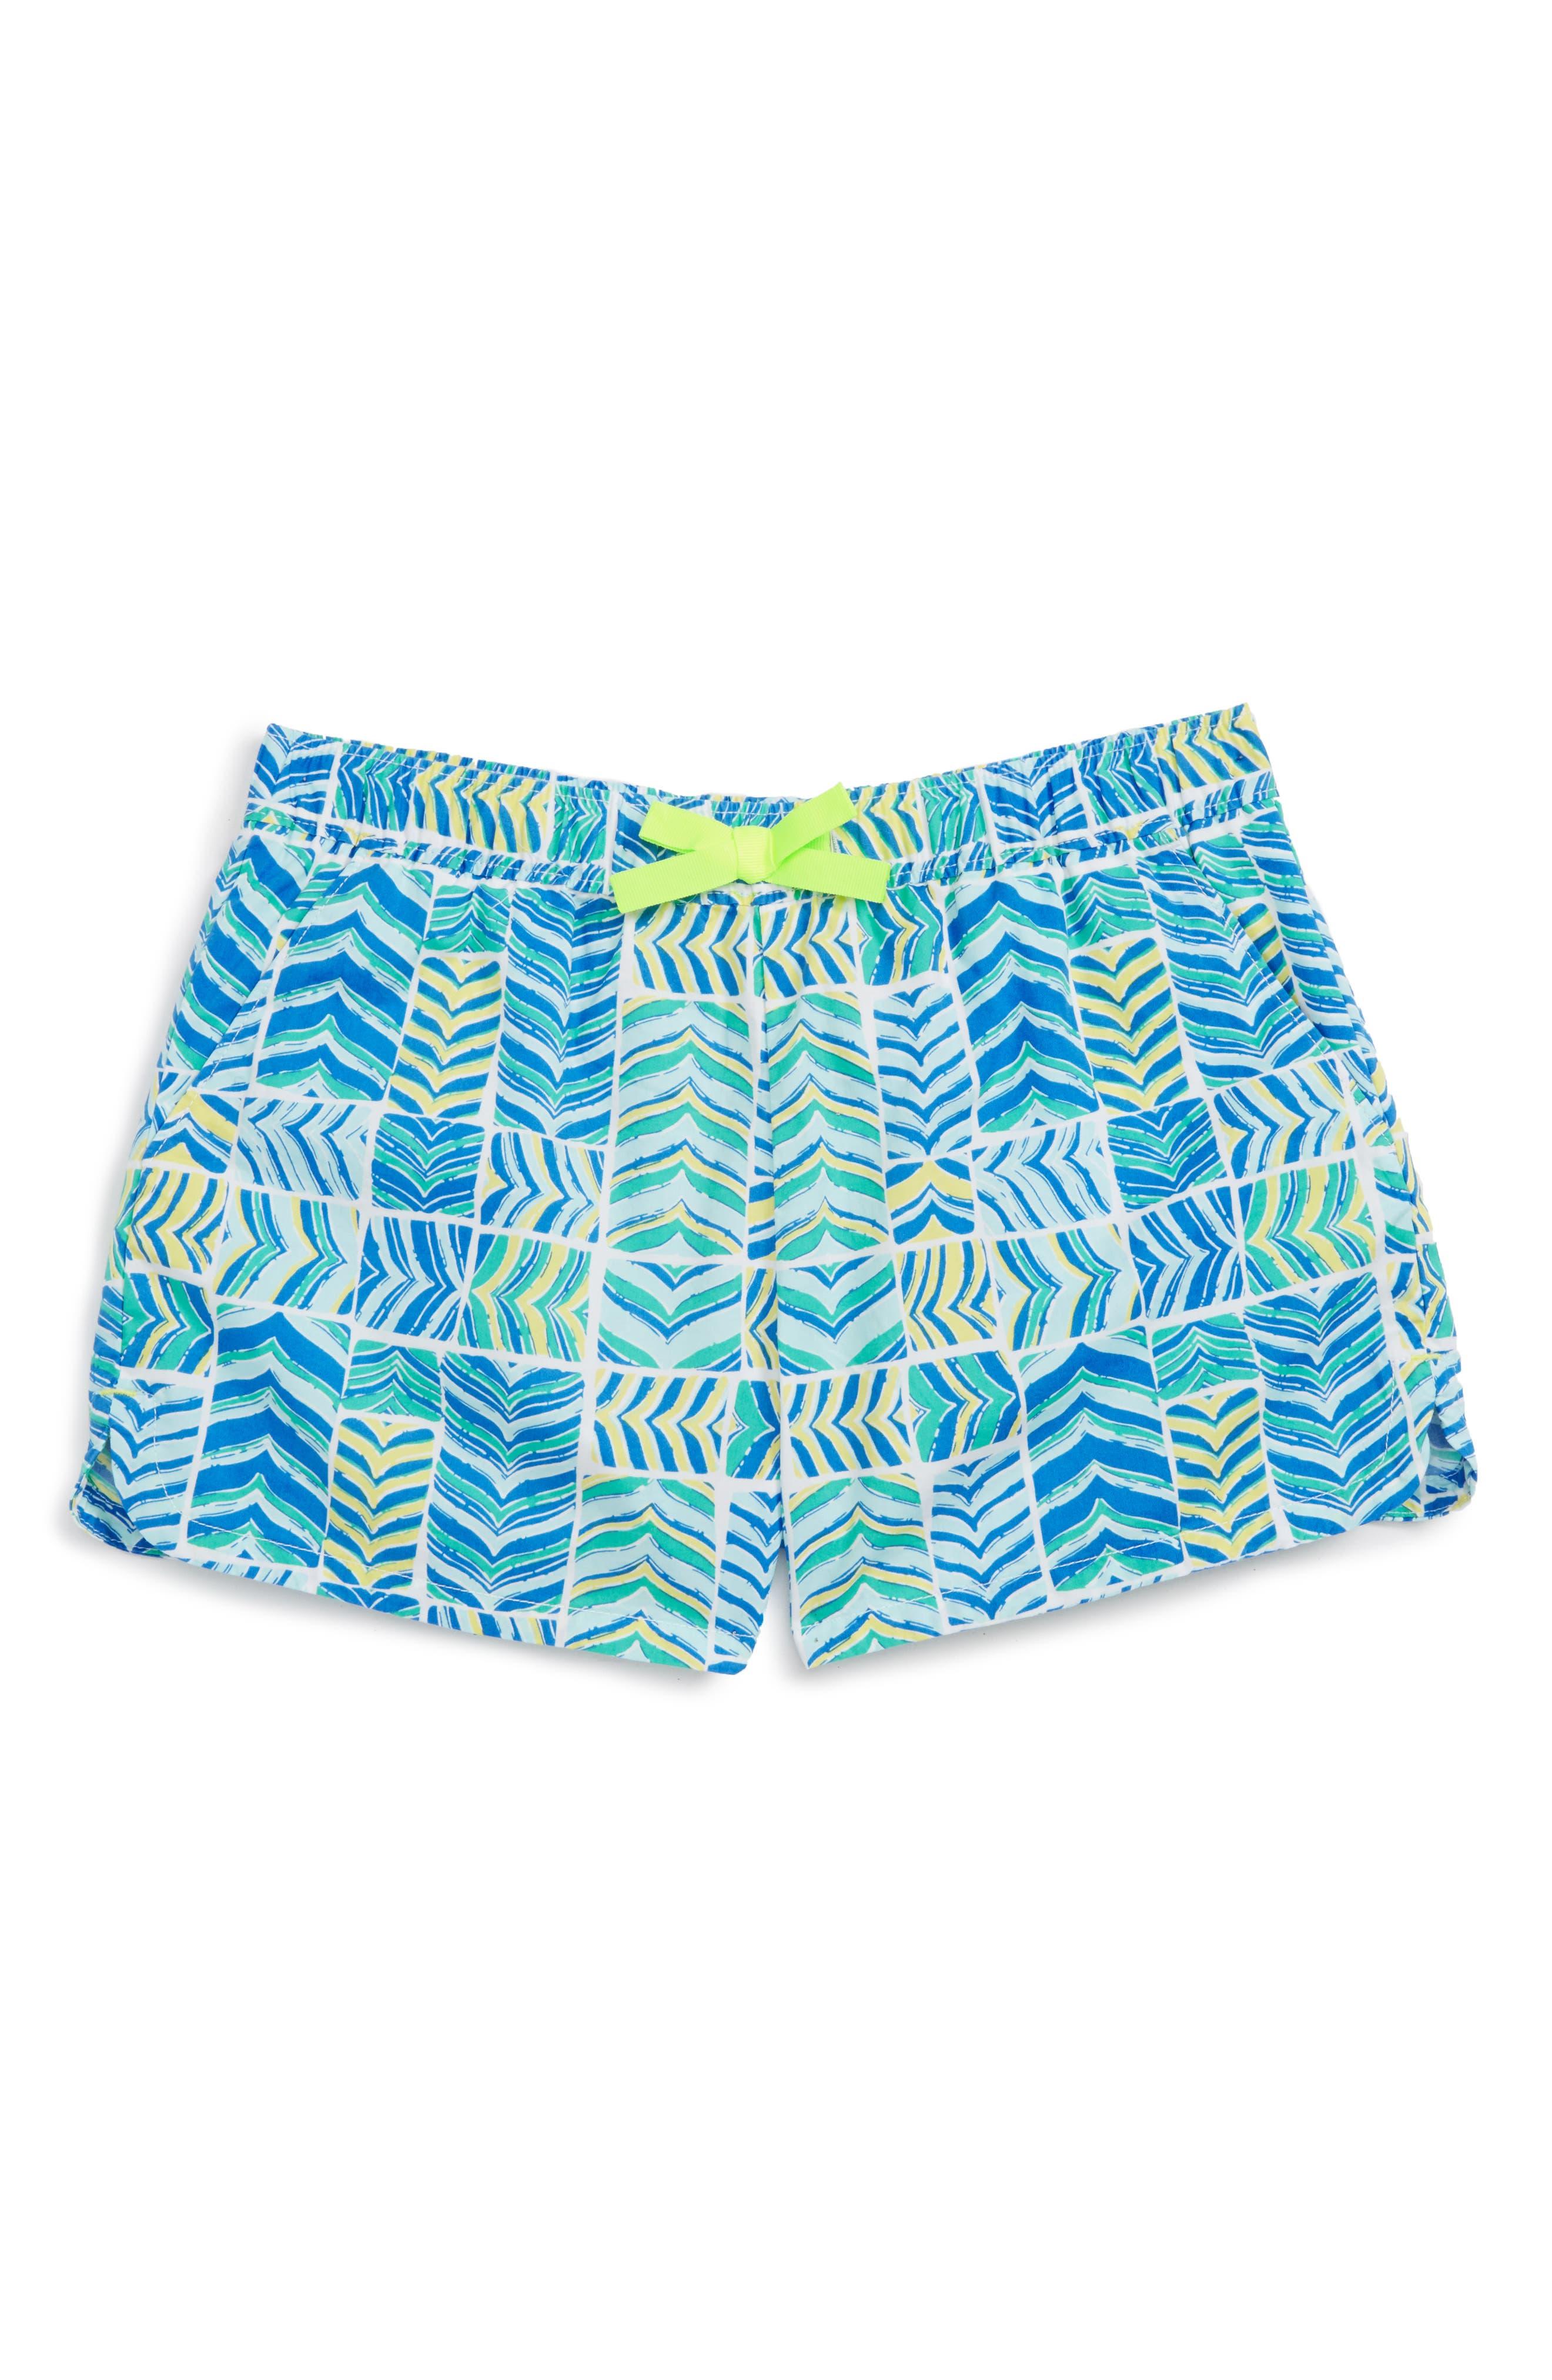 Whaletail Patchwork Shorts,                         Main,                         color, Azure Blue